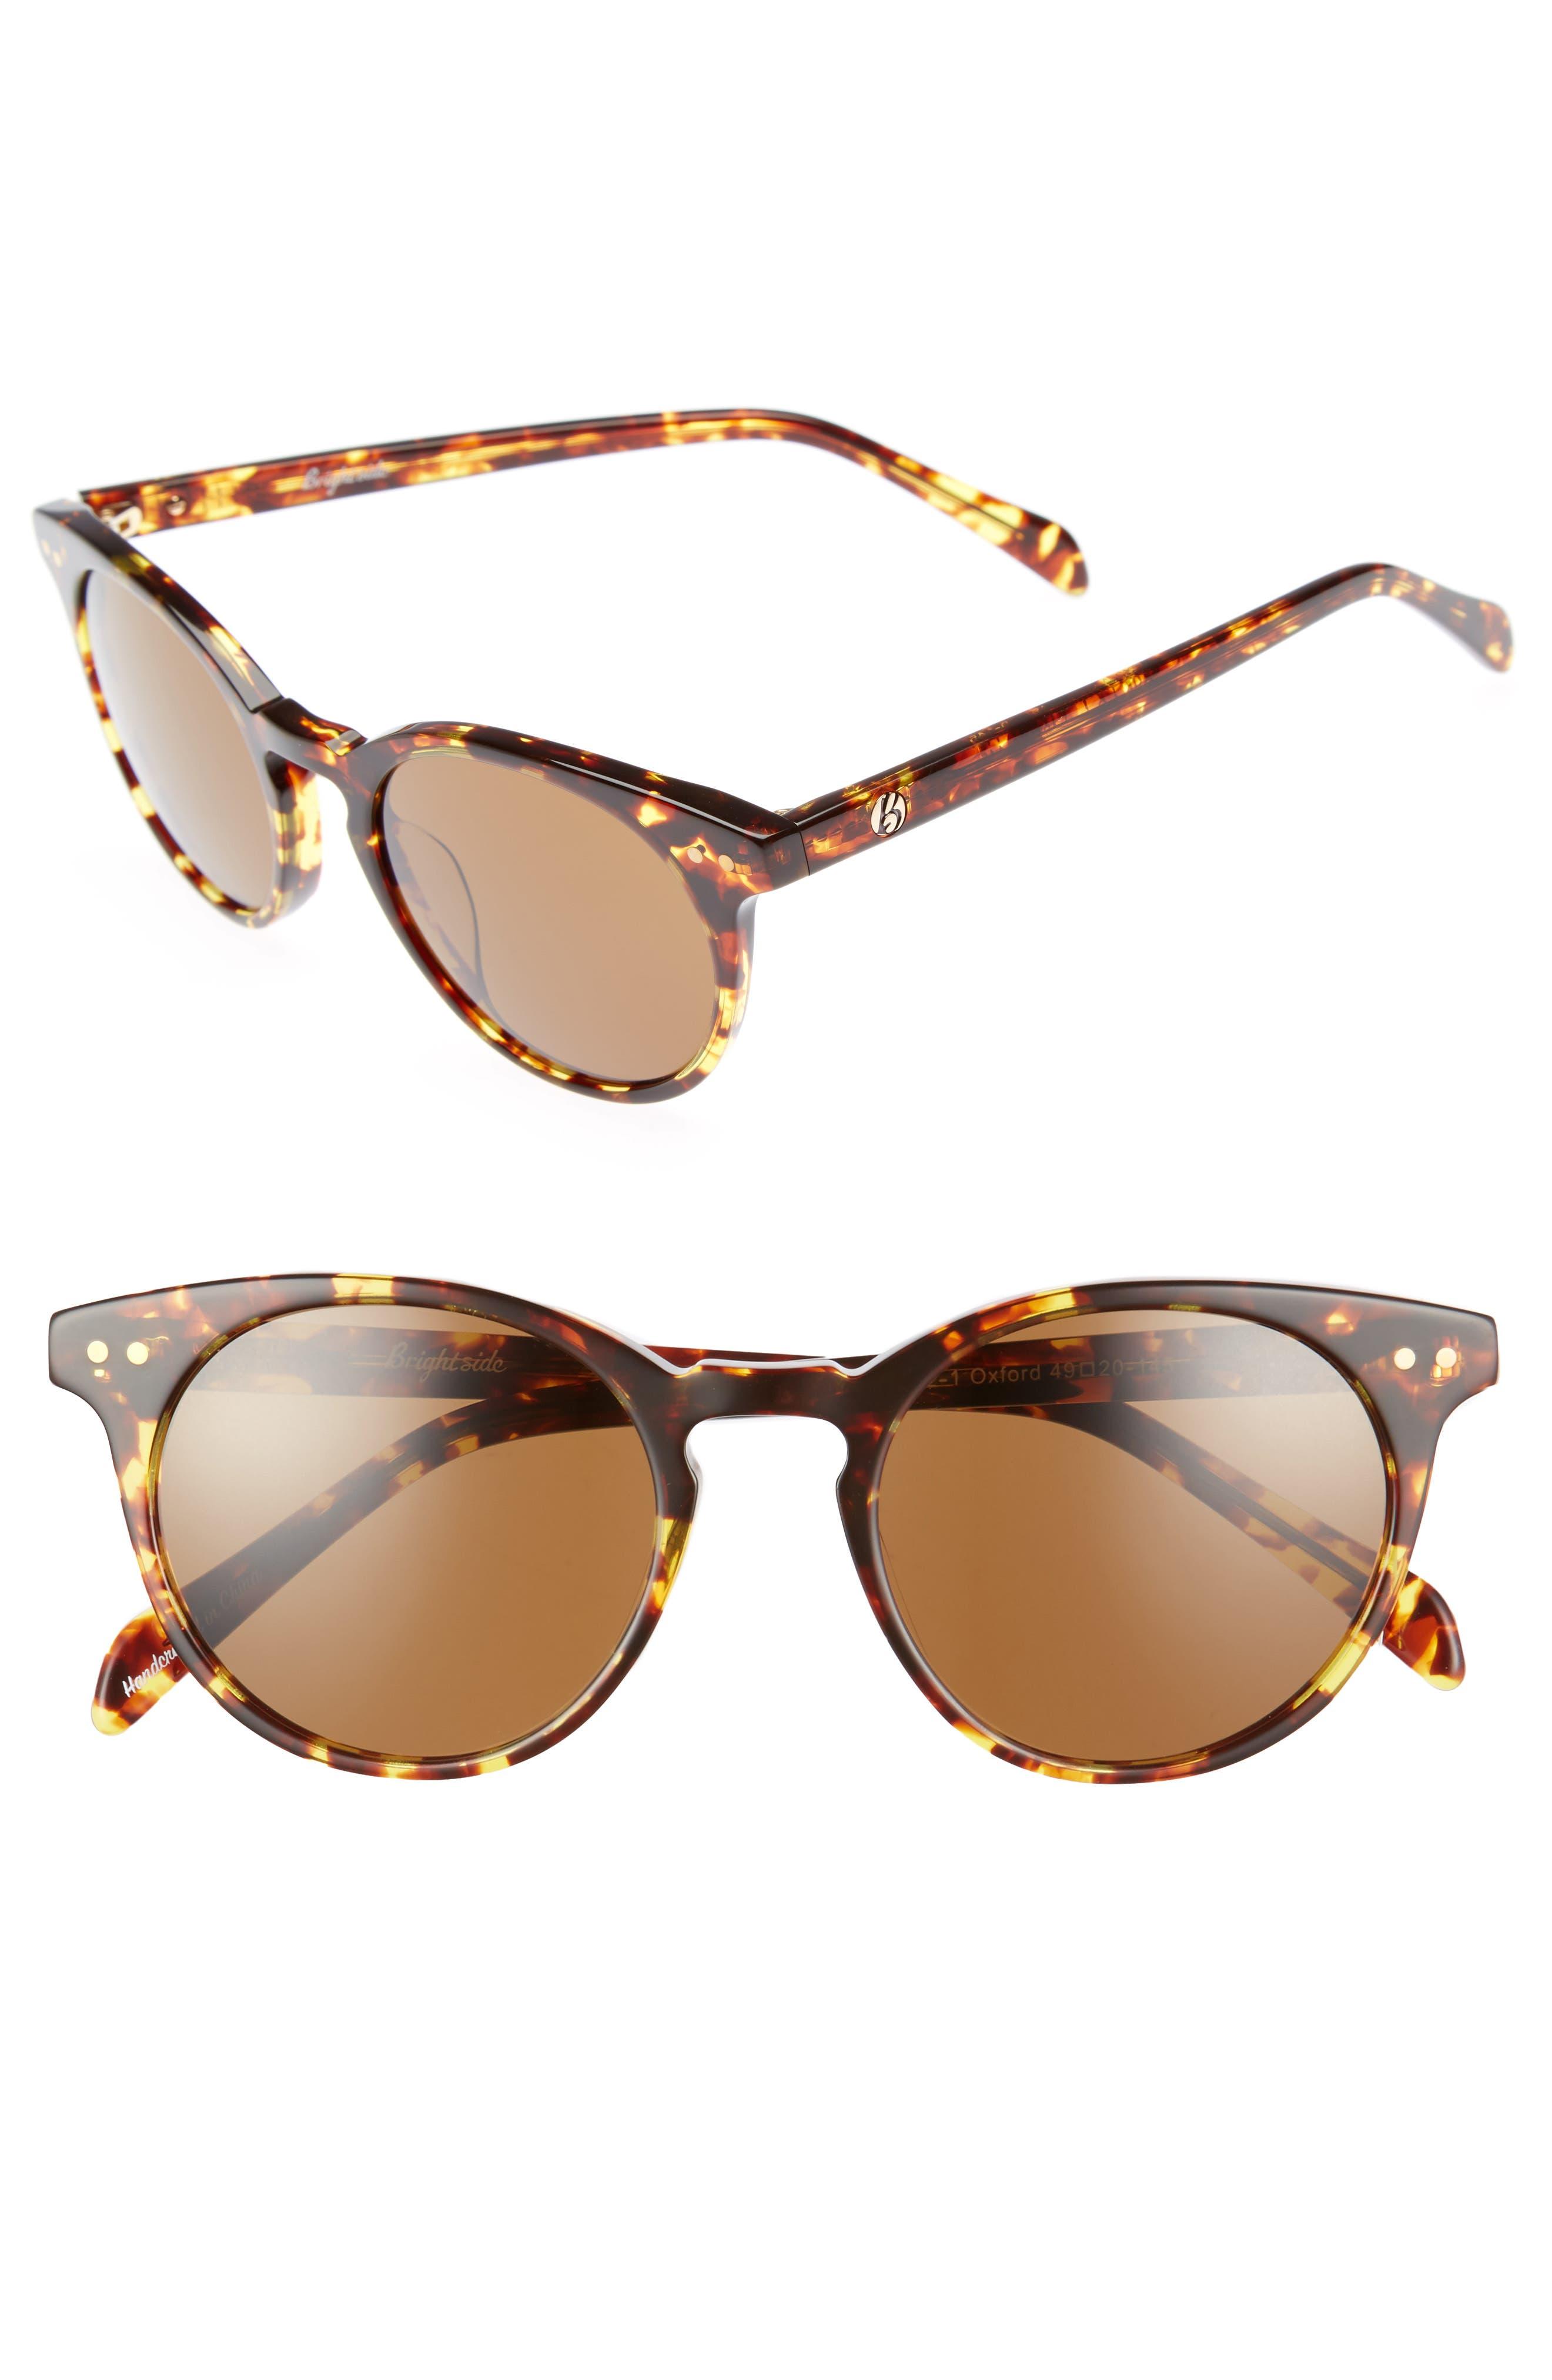 Oxford 49mm Sunglasses,                             Main thumbnail 1, color,                             Classic Tortoise/ Brown